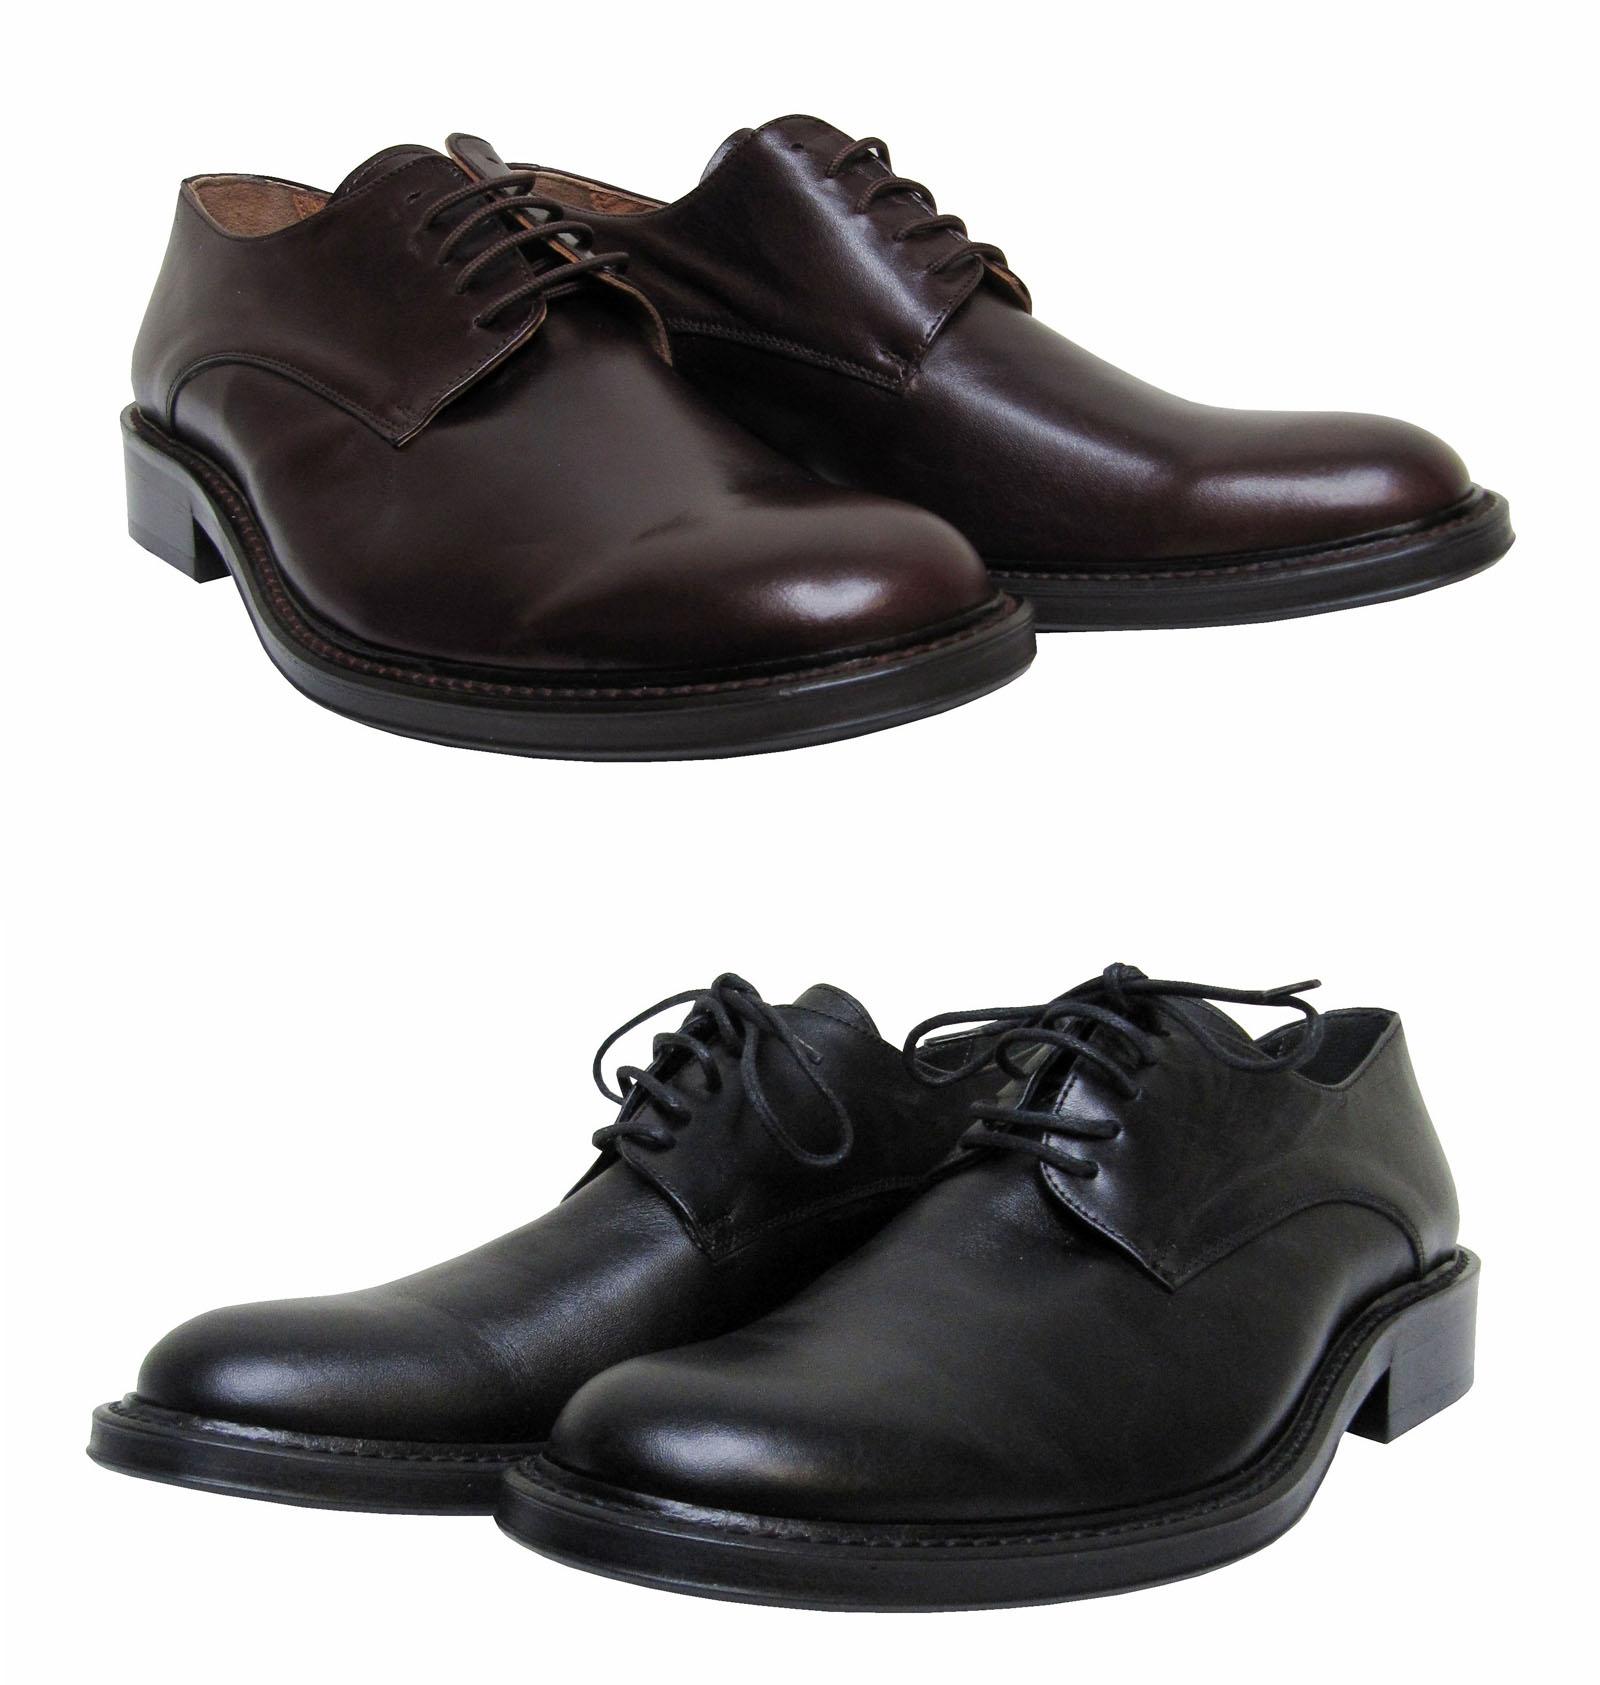 97058c7cfafbaa Robuste Muga Herren Schuhe 630